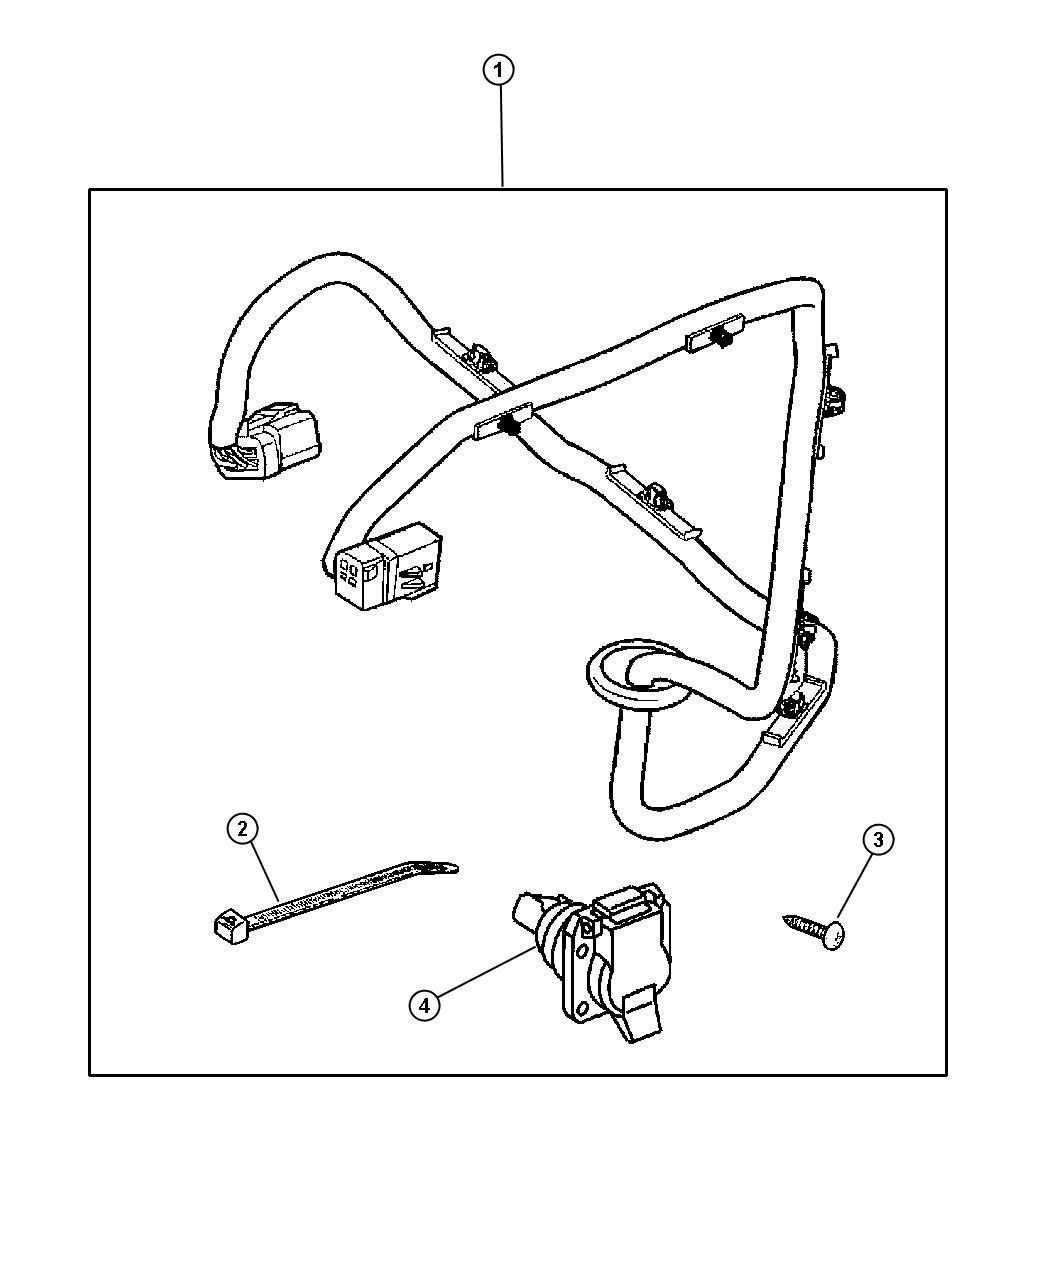 82204724ab - mopar wiring kit  trailer tow